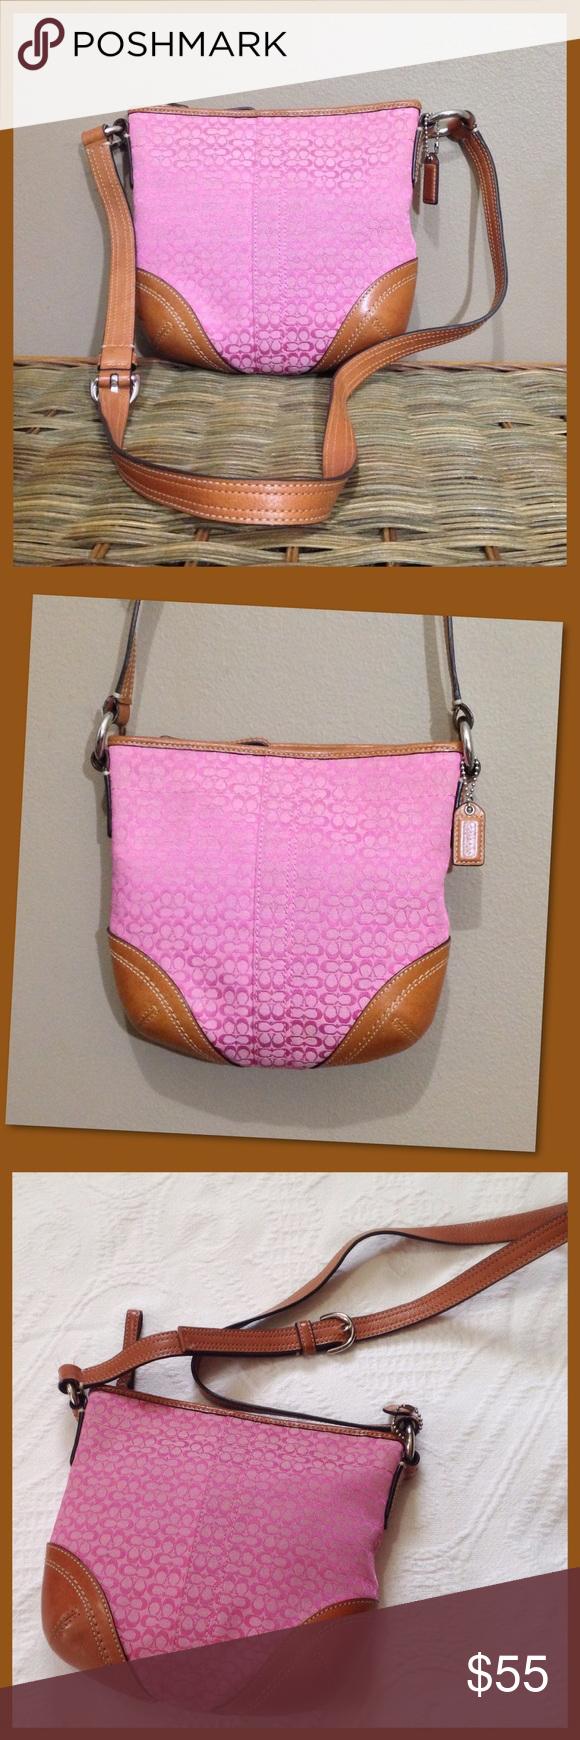 fedb1ae9ec0 Coach Slim Signature Crossbody Bag Mini pink signature jacquard and tan  leather trim with silver hardware